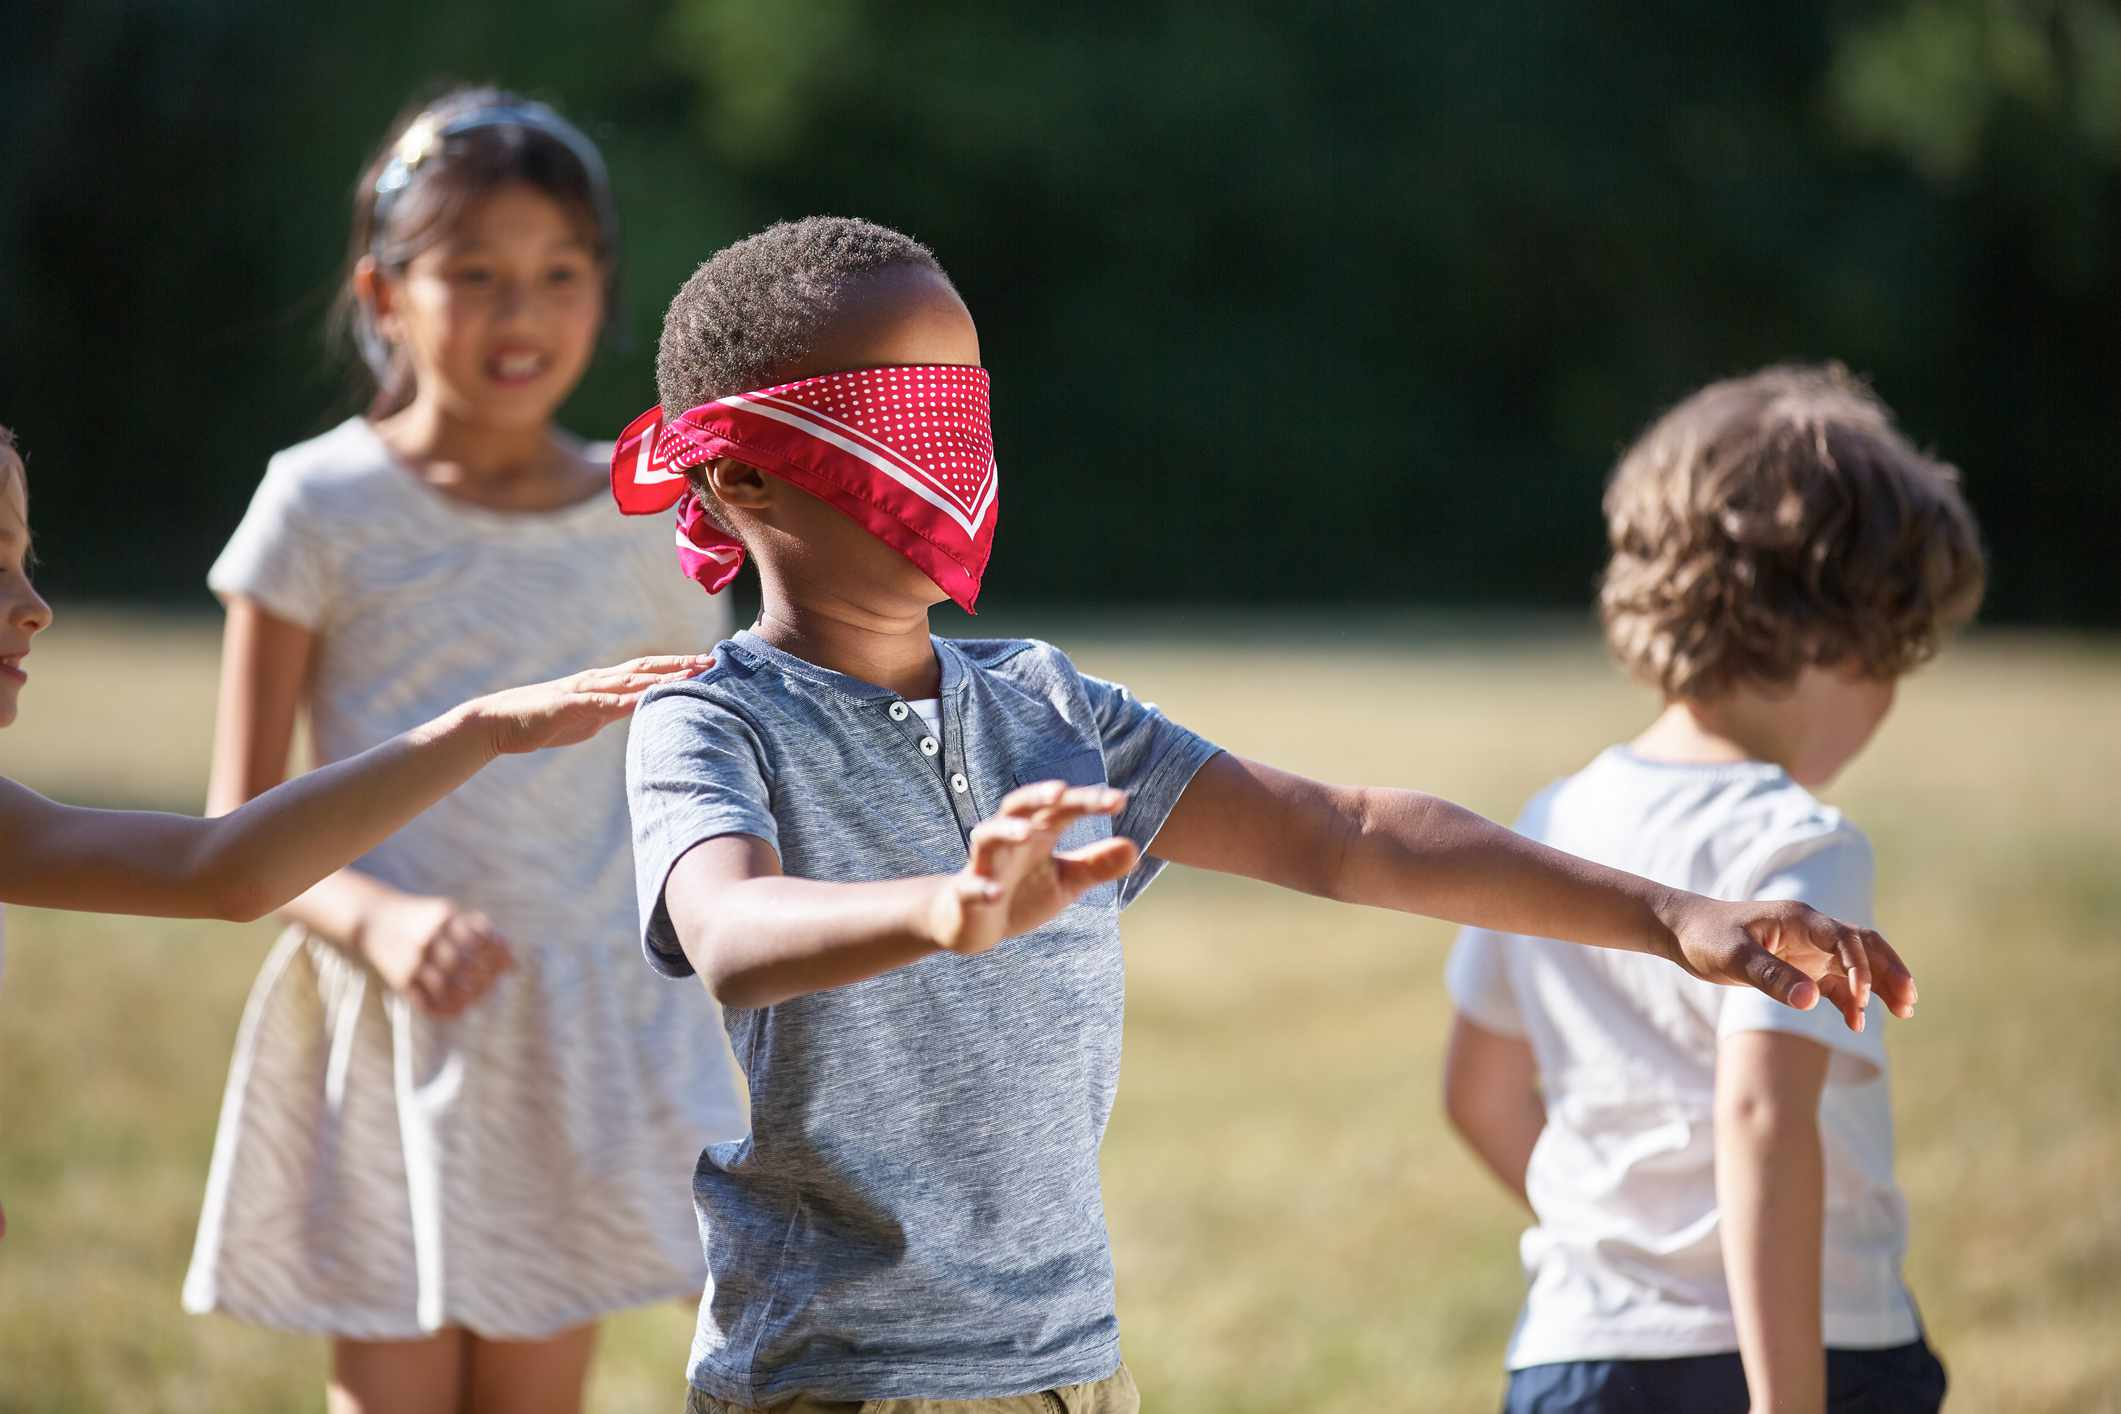 Blindfold Boy Searching Friends On Field